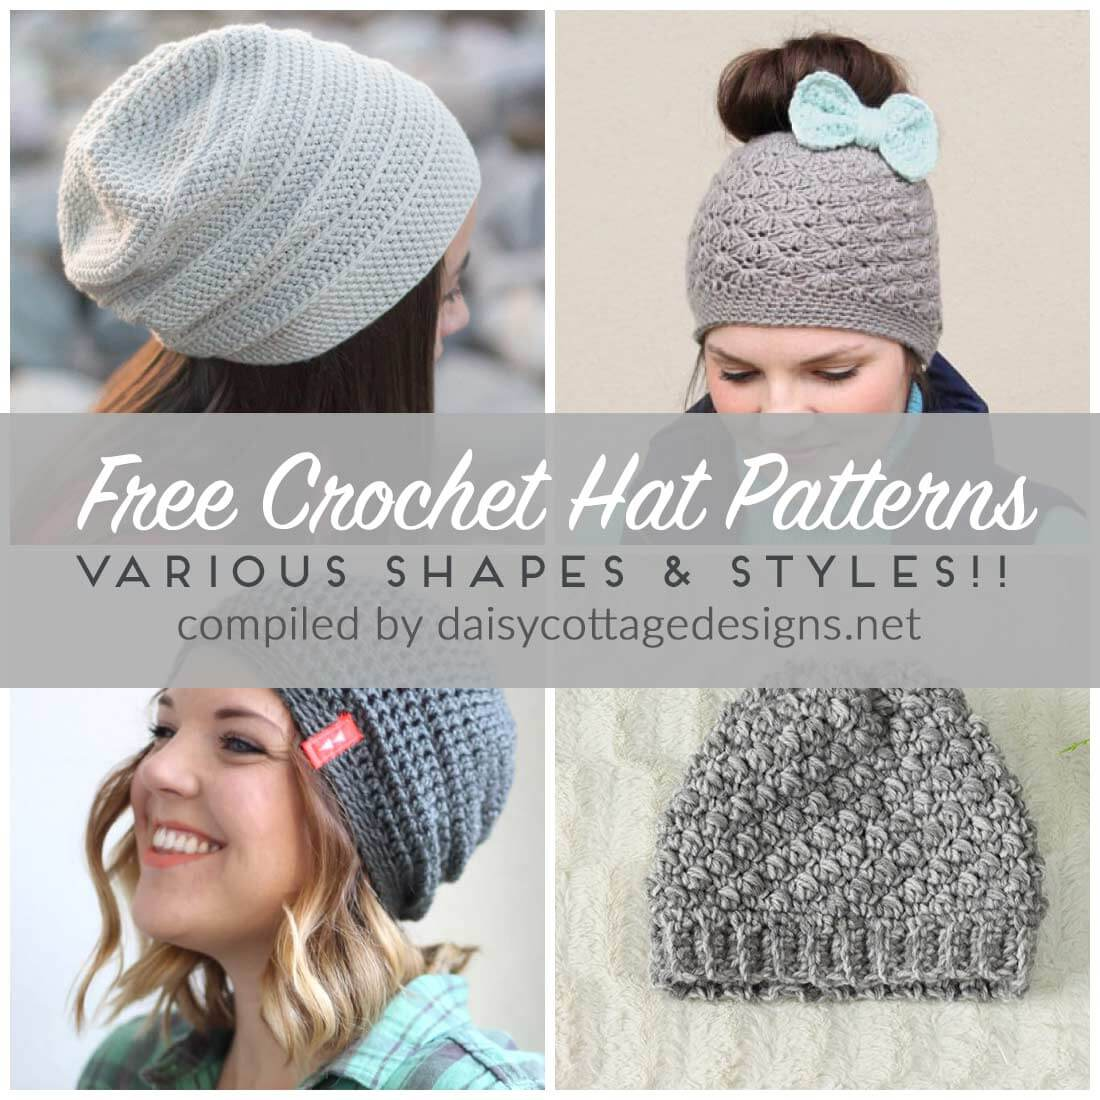 free crochet hat patterns | free crochet patterns | crochet patterns | use auzvlum